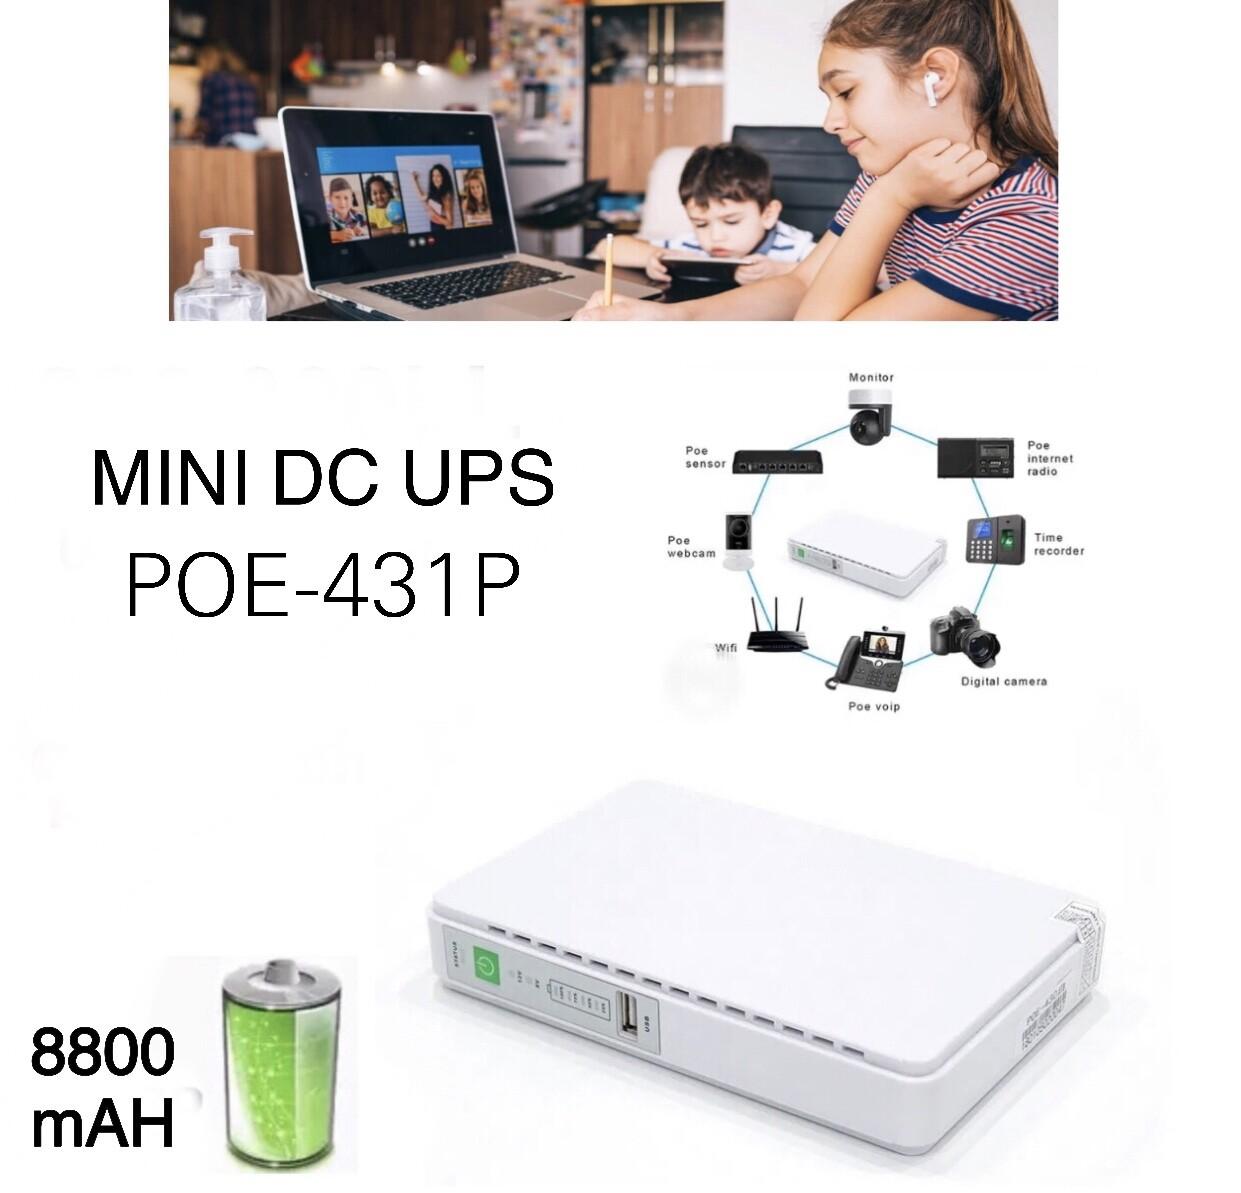 Mini DC UPS